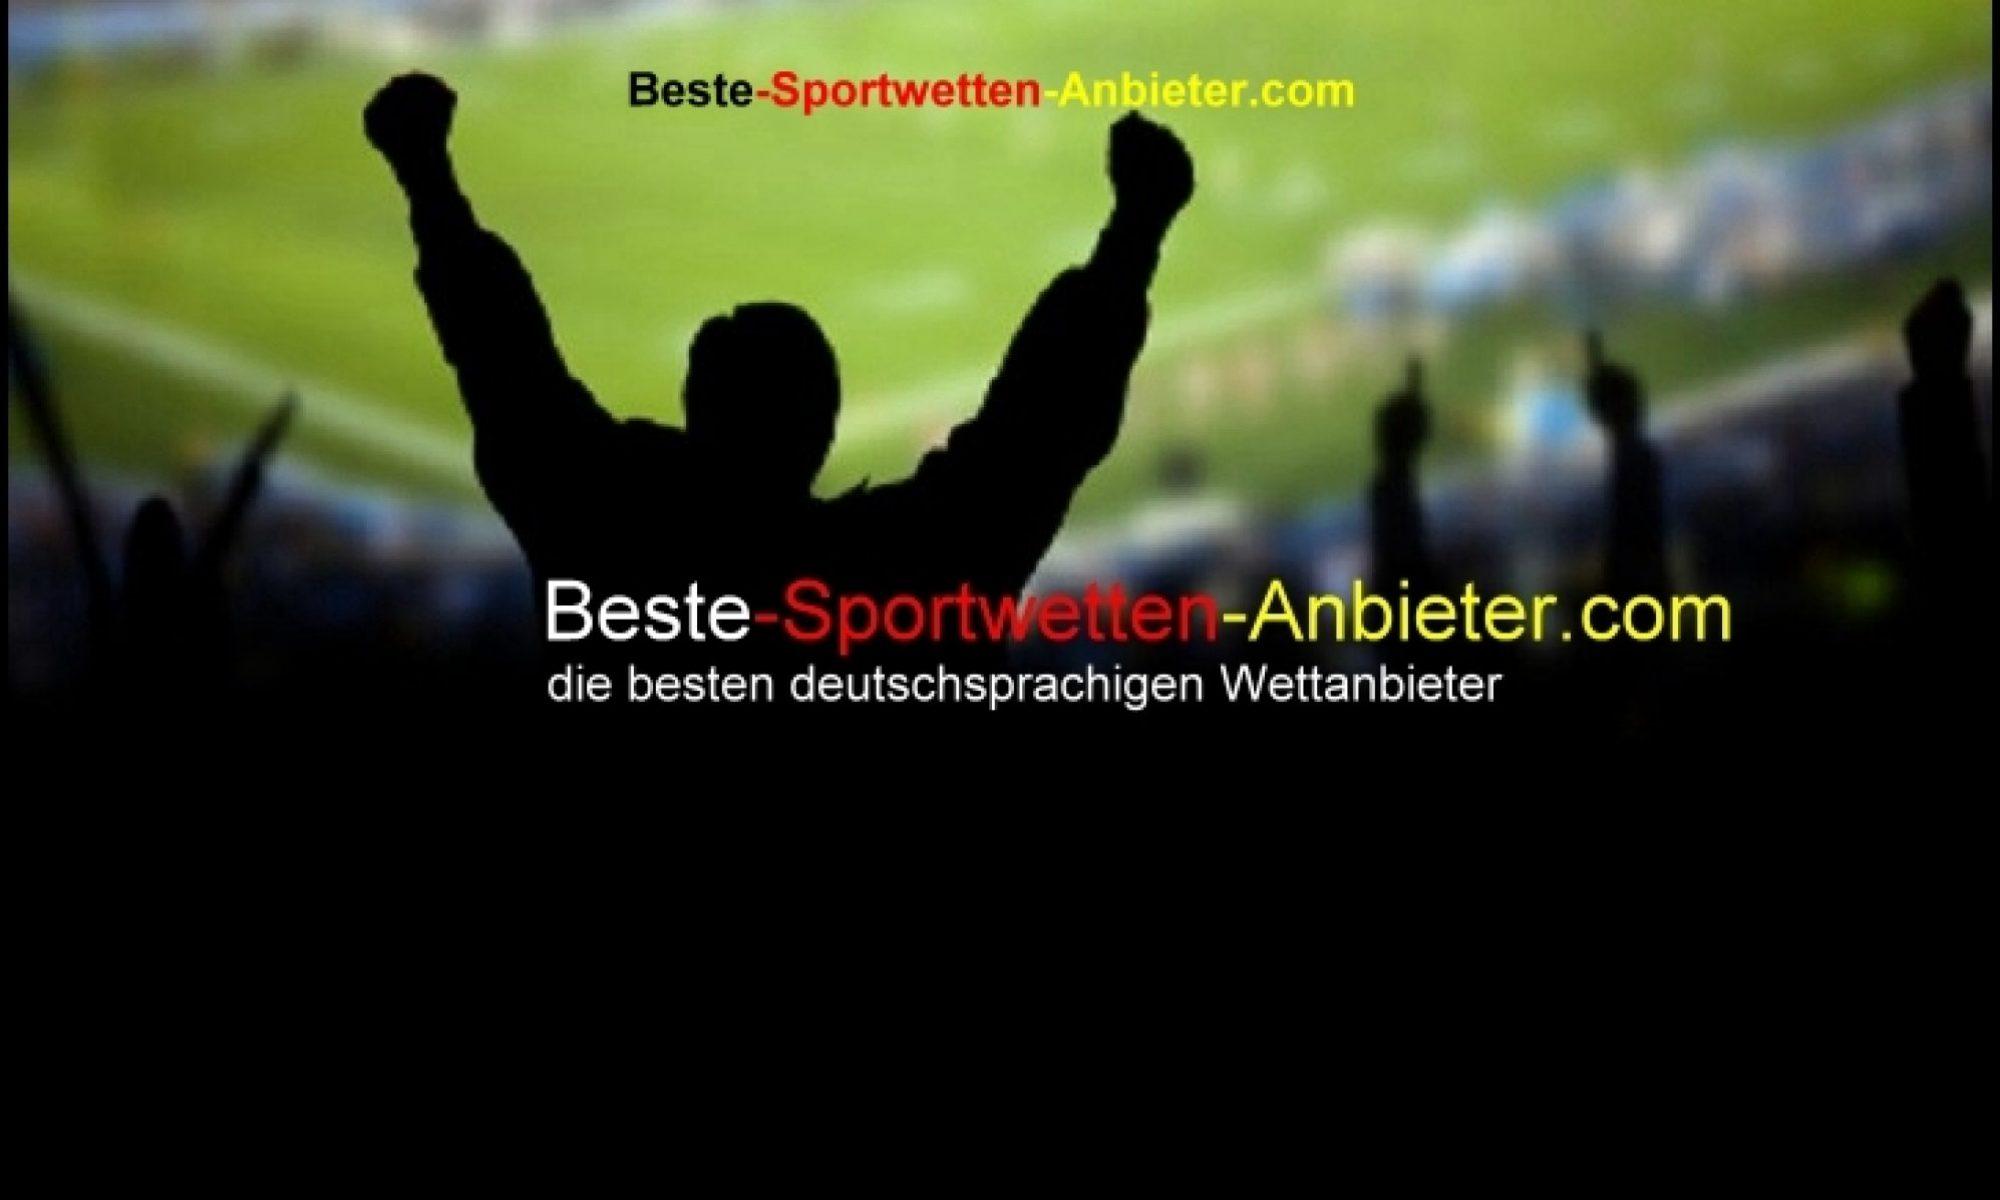 besten sportwettenanbieter